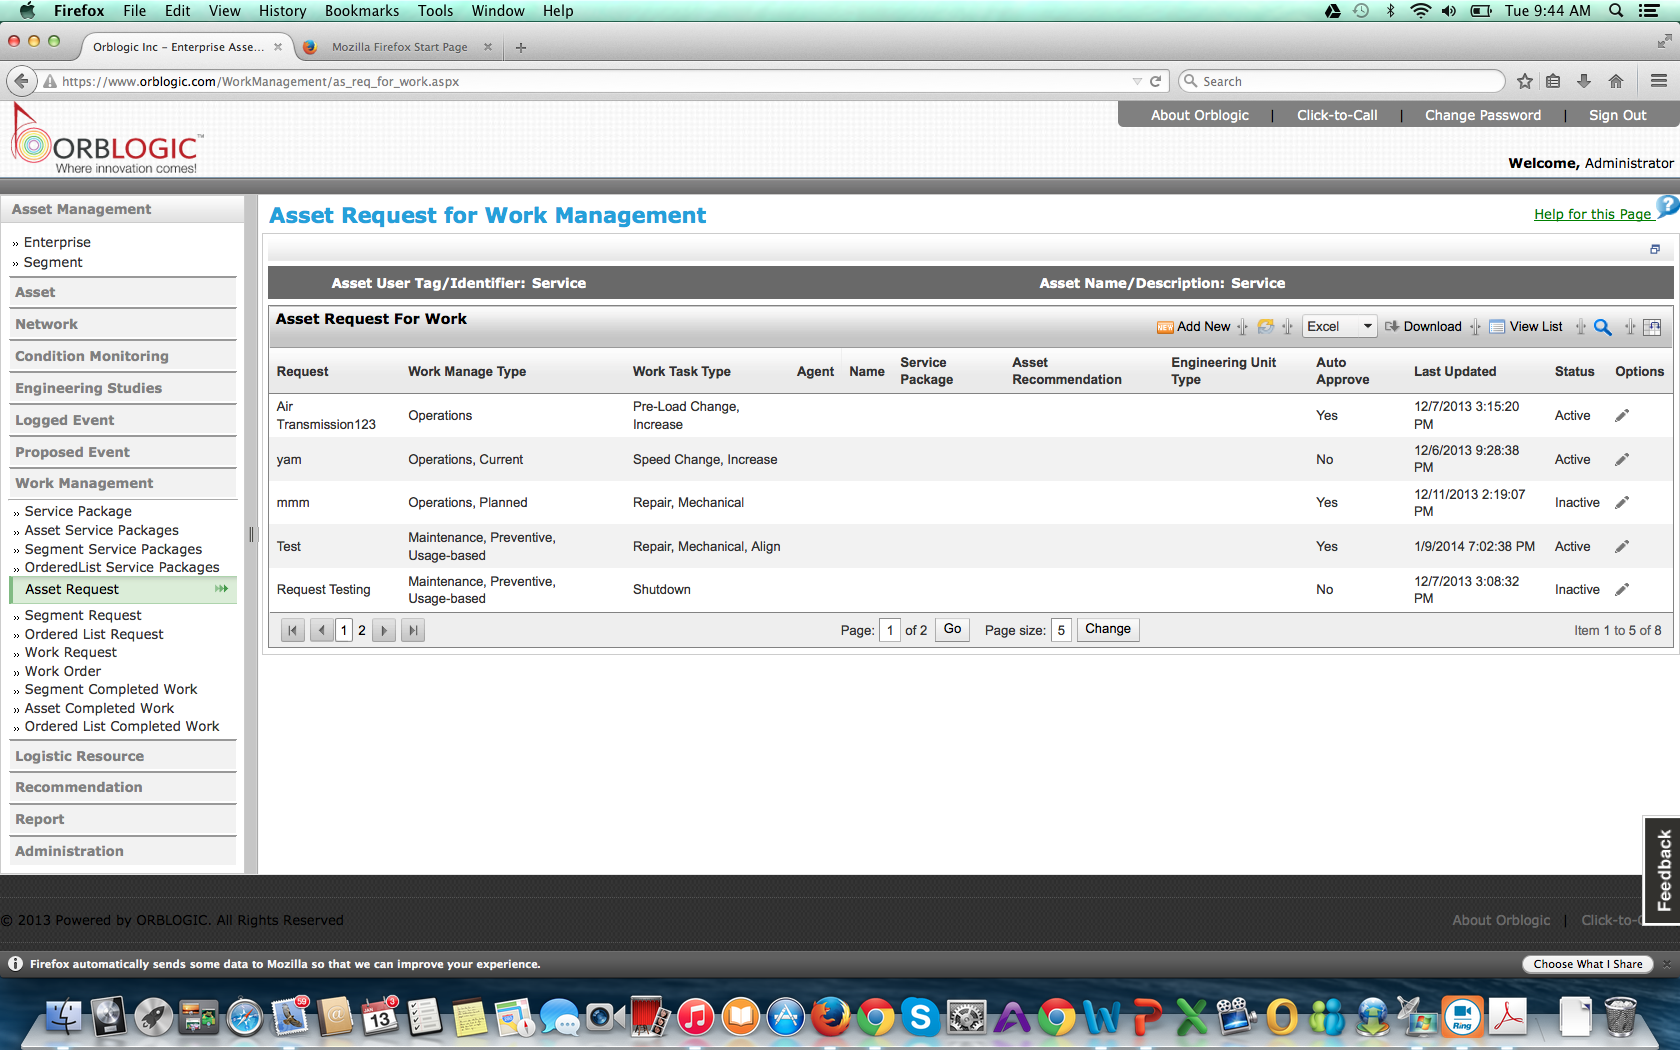 Asset Request for Work Management